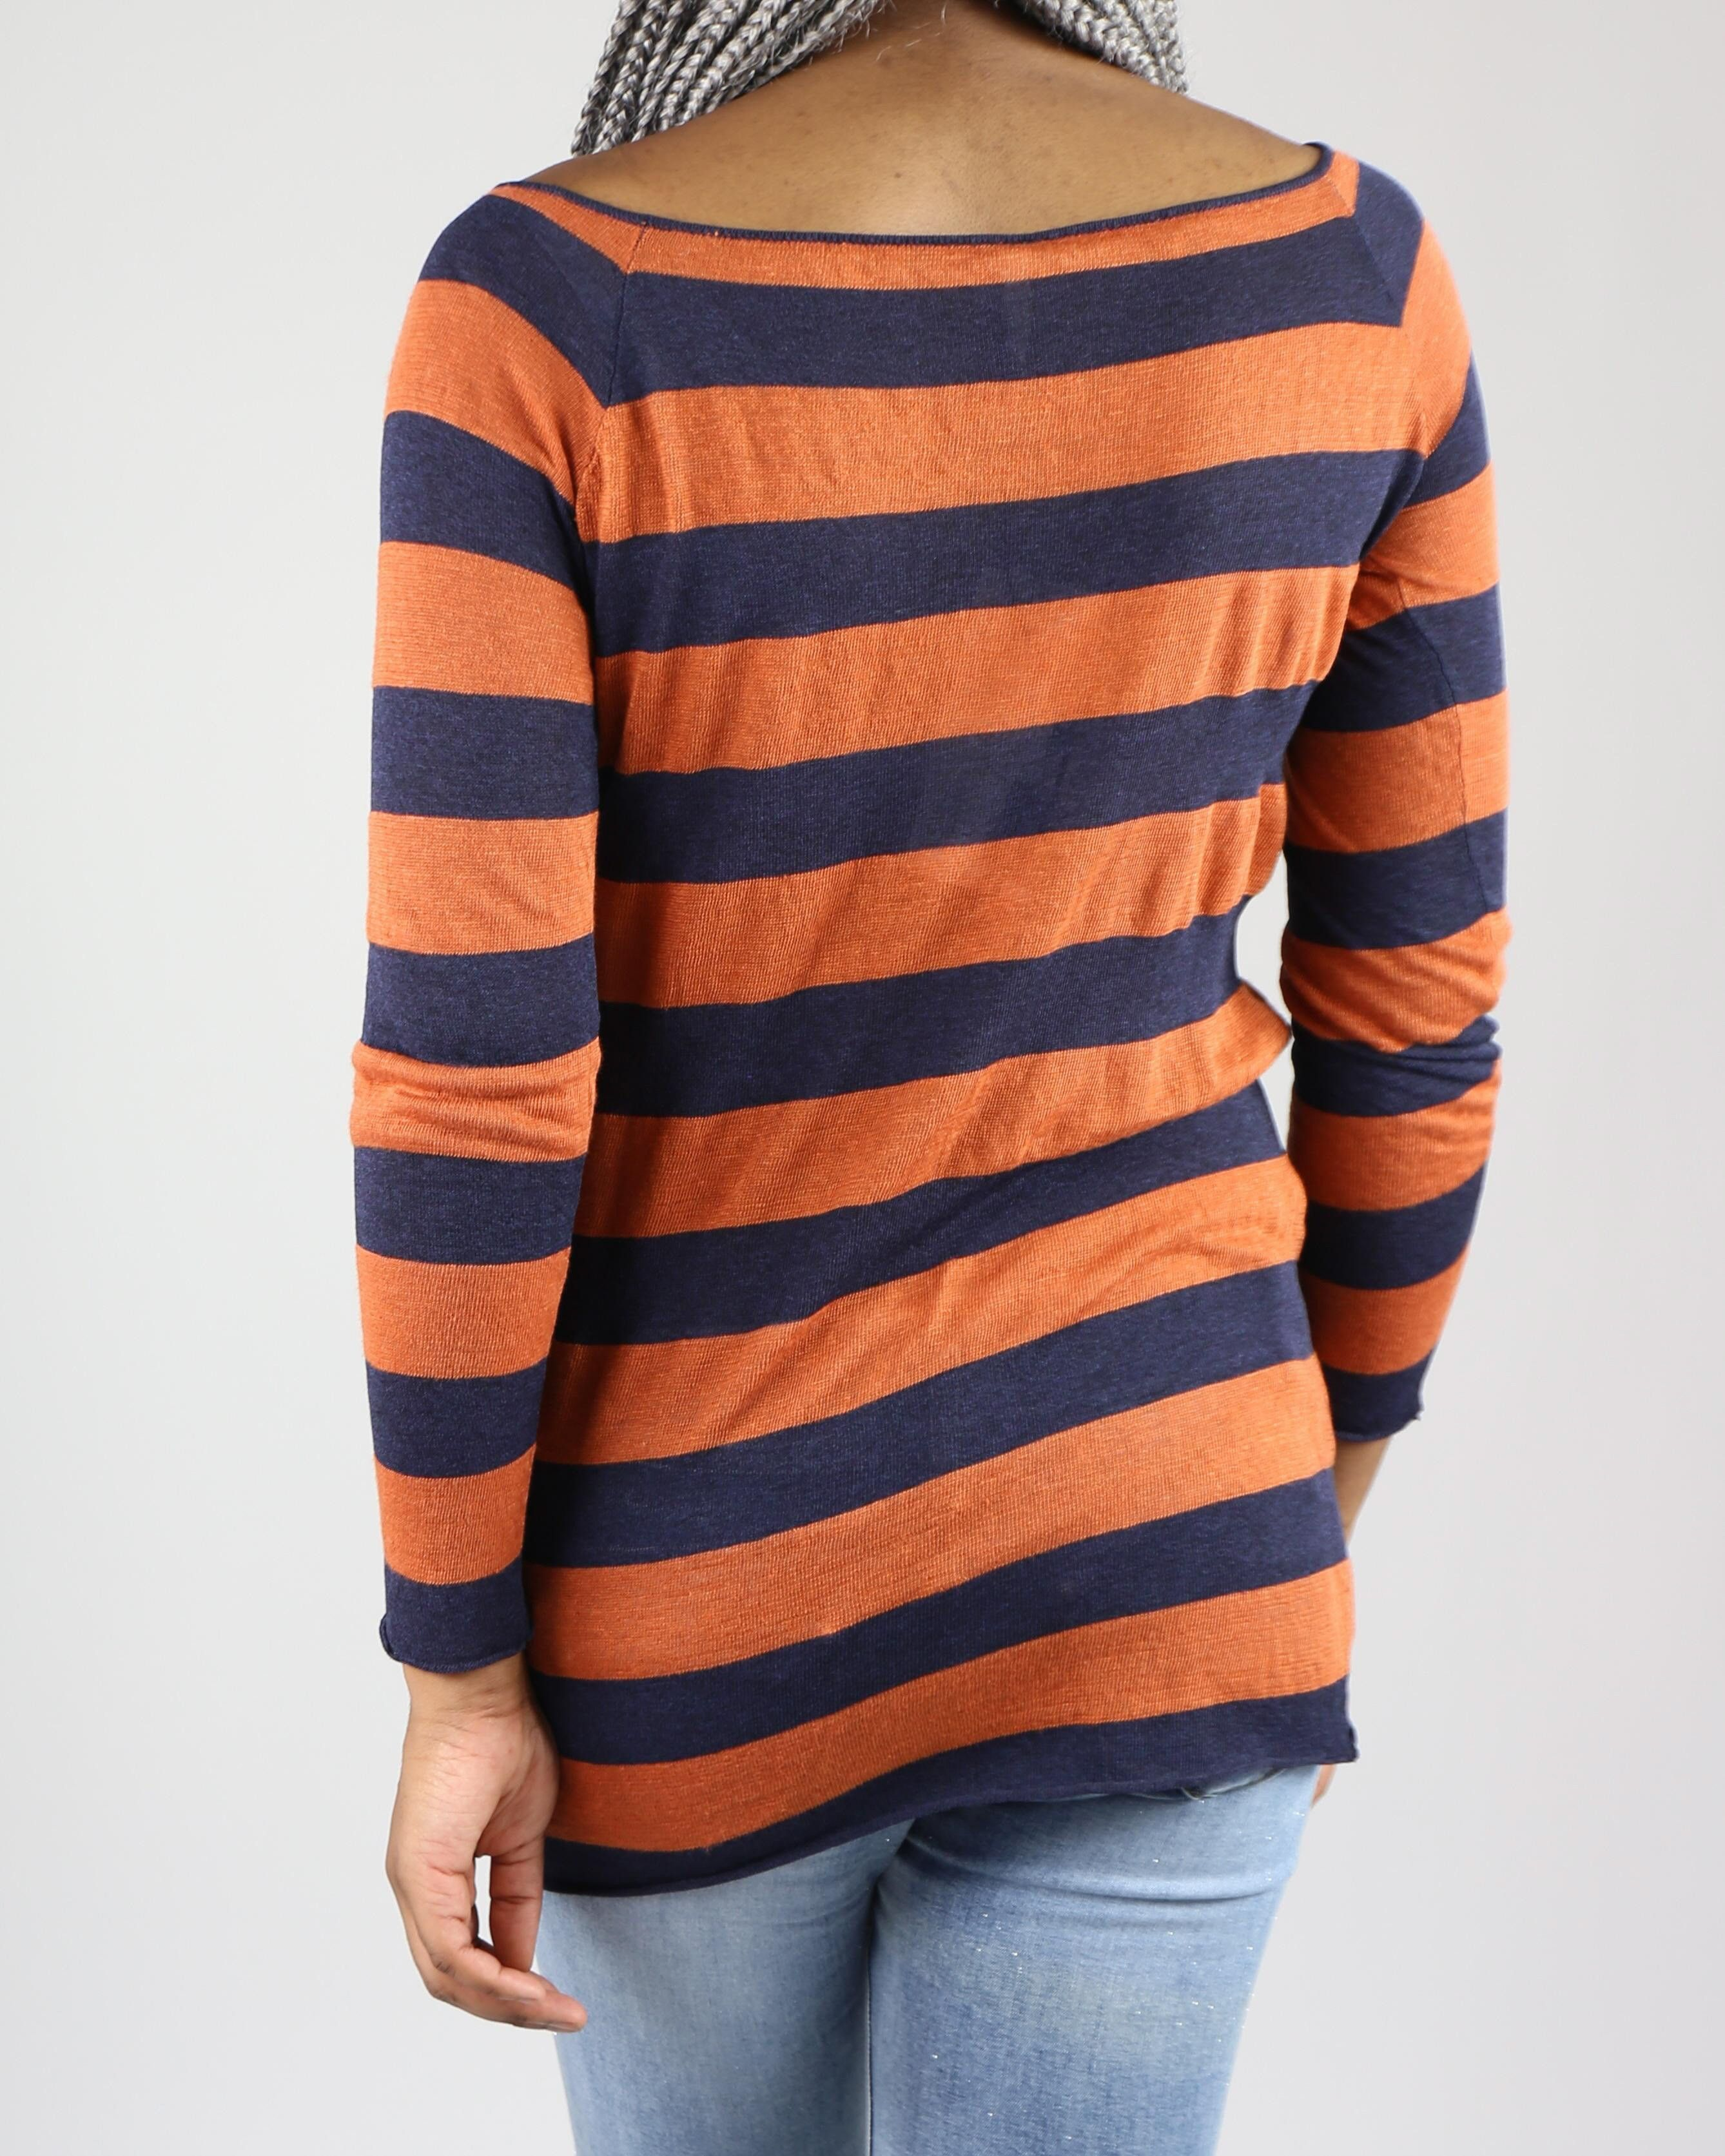 Pull fin rayé orange et bleu Liis Japan